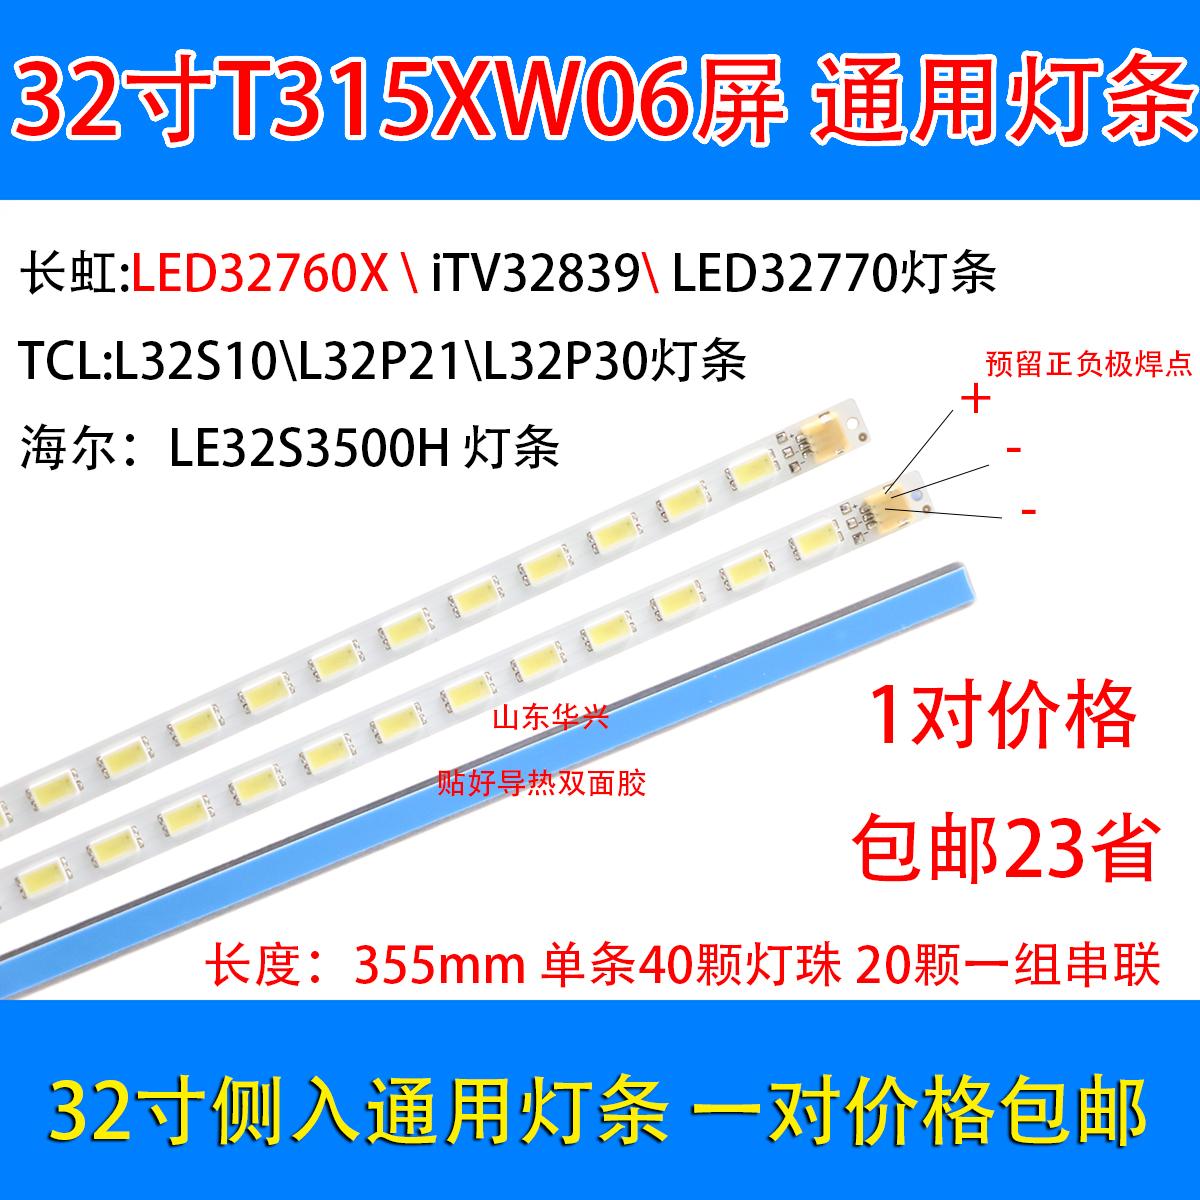 包邮长虹LED32760X灯条TCL L32S10 L32P21/30配T315XW06屏灯条